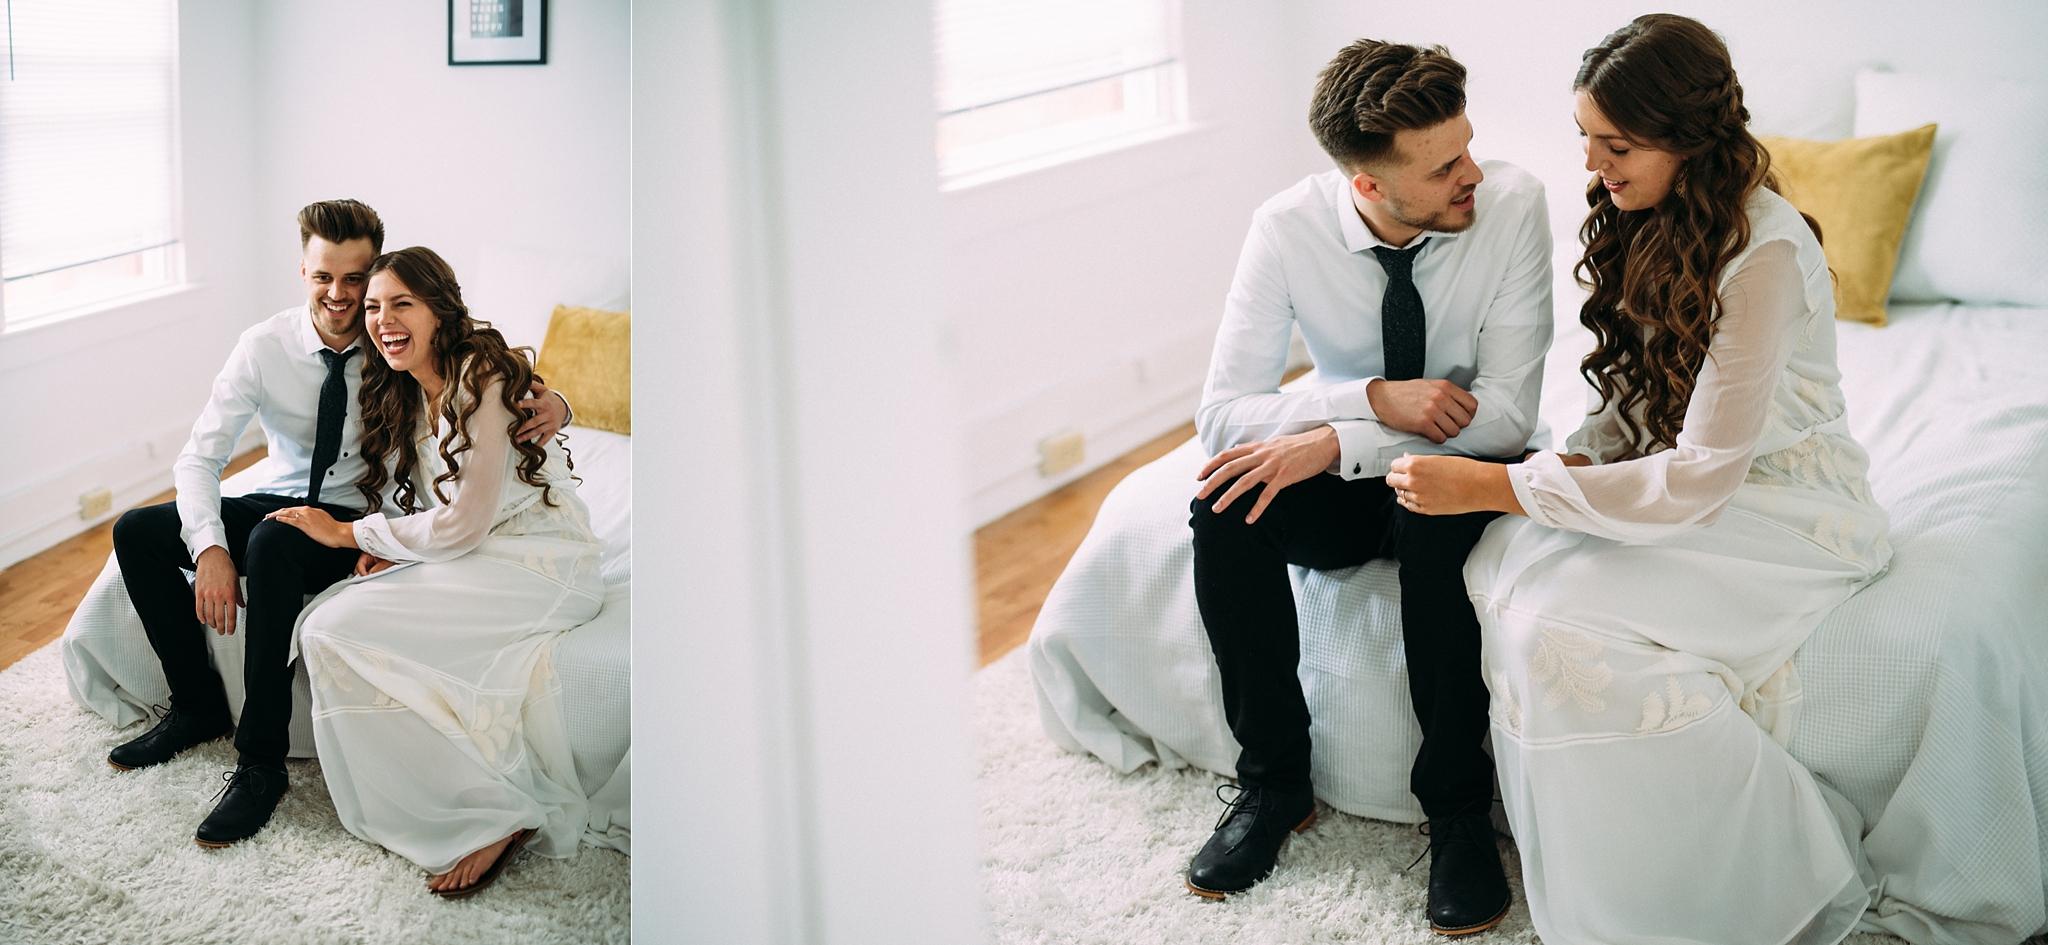 kaihla_tonai_intimate_wedding_elopement_photographer_4042